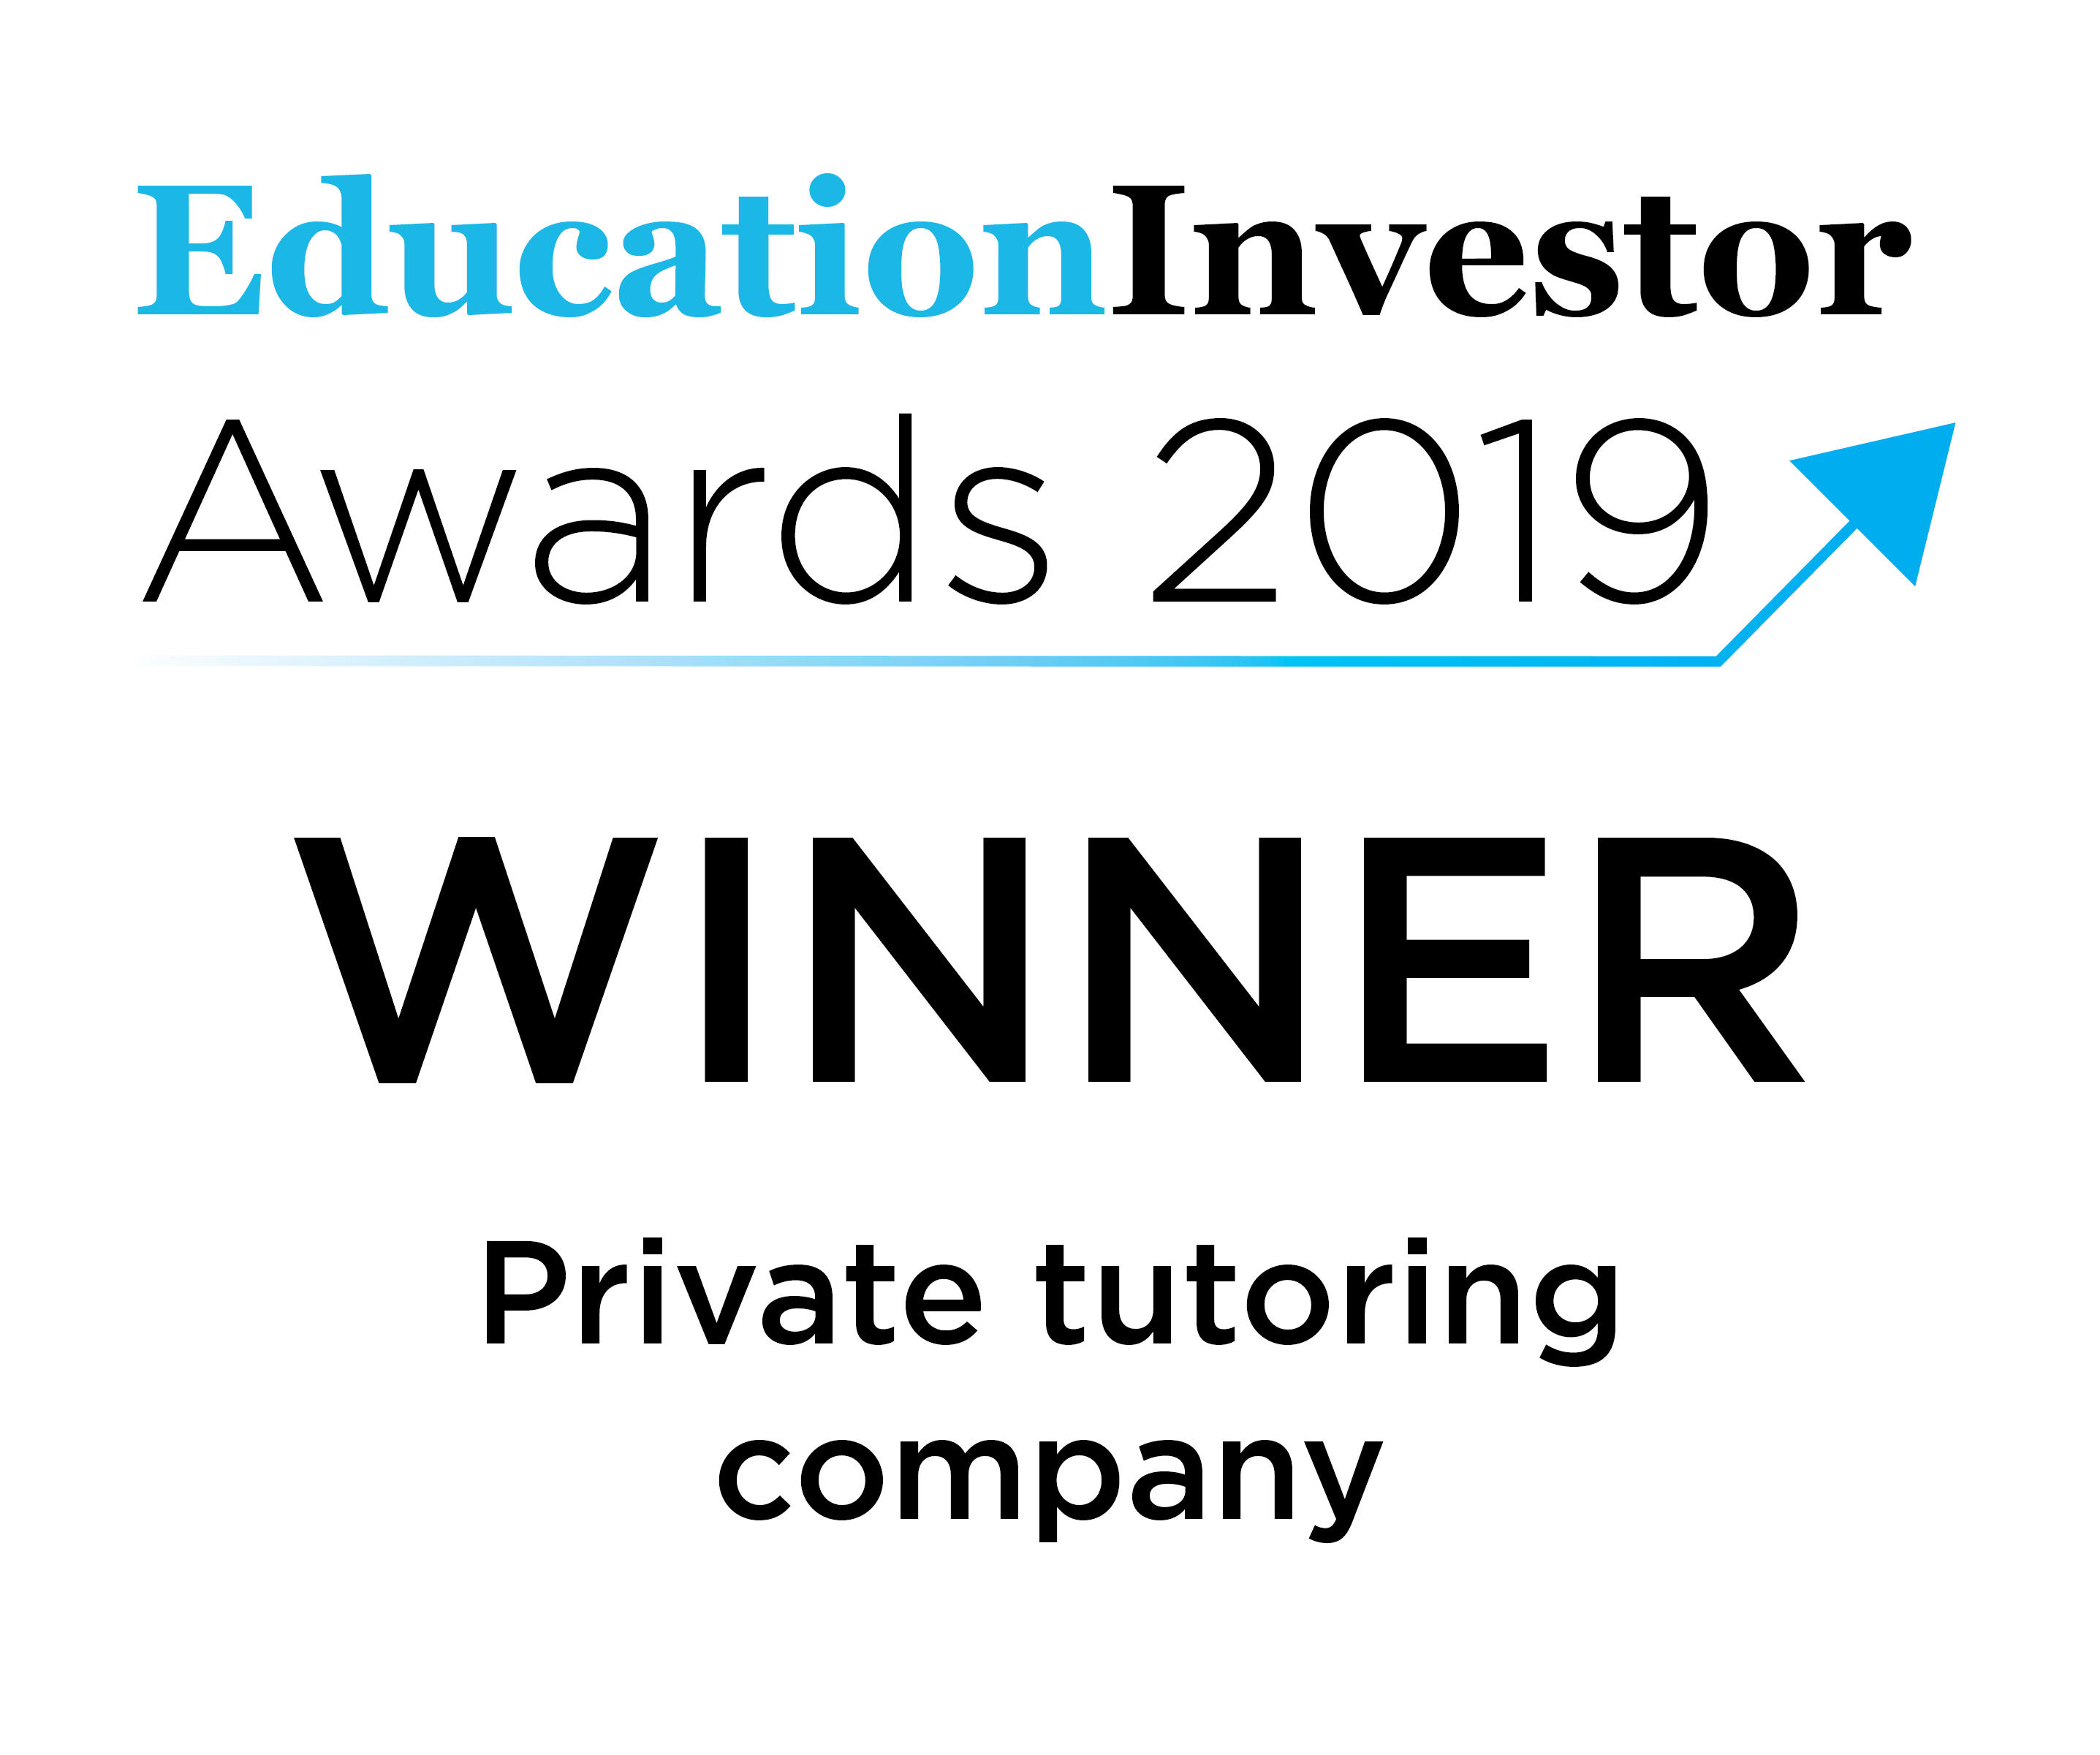 Education Investor Award Winners